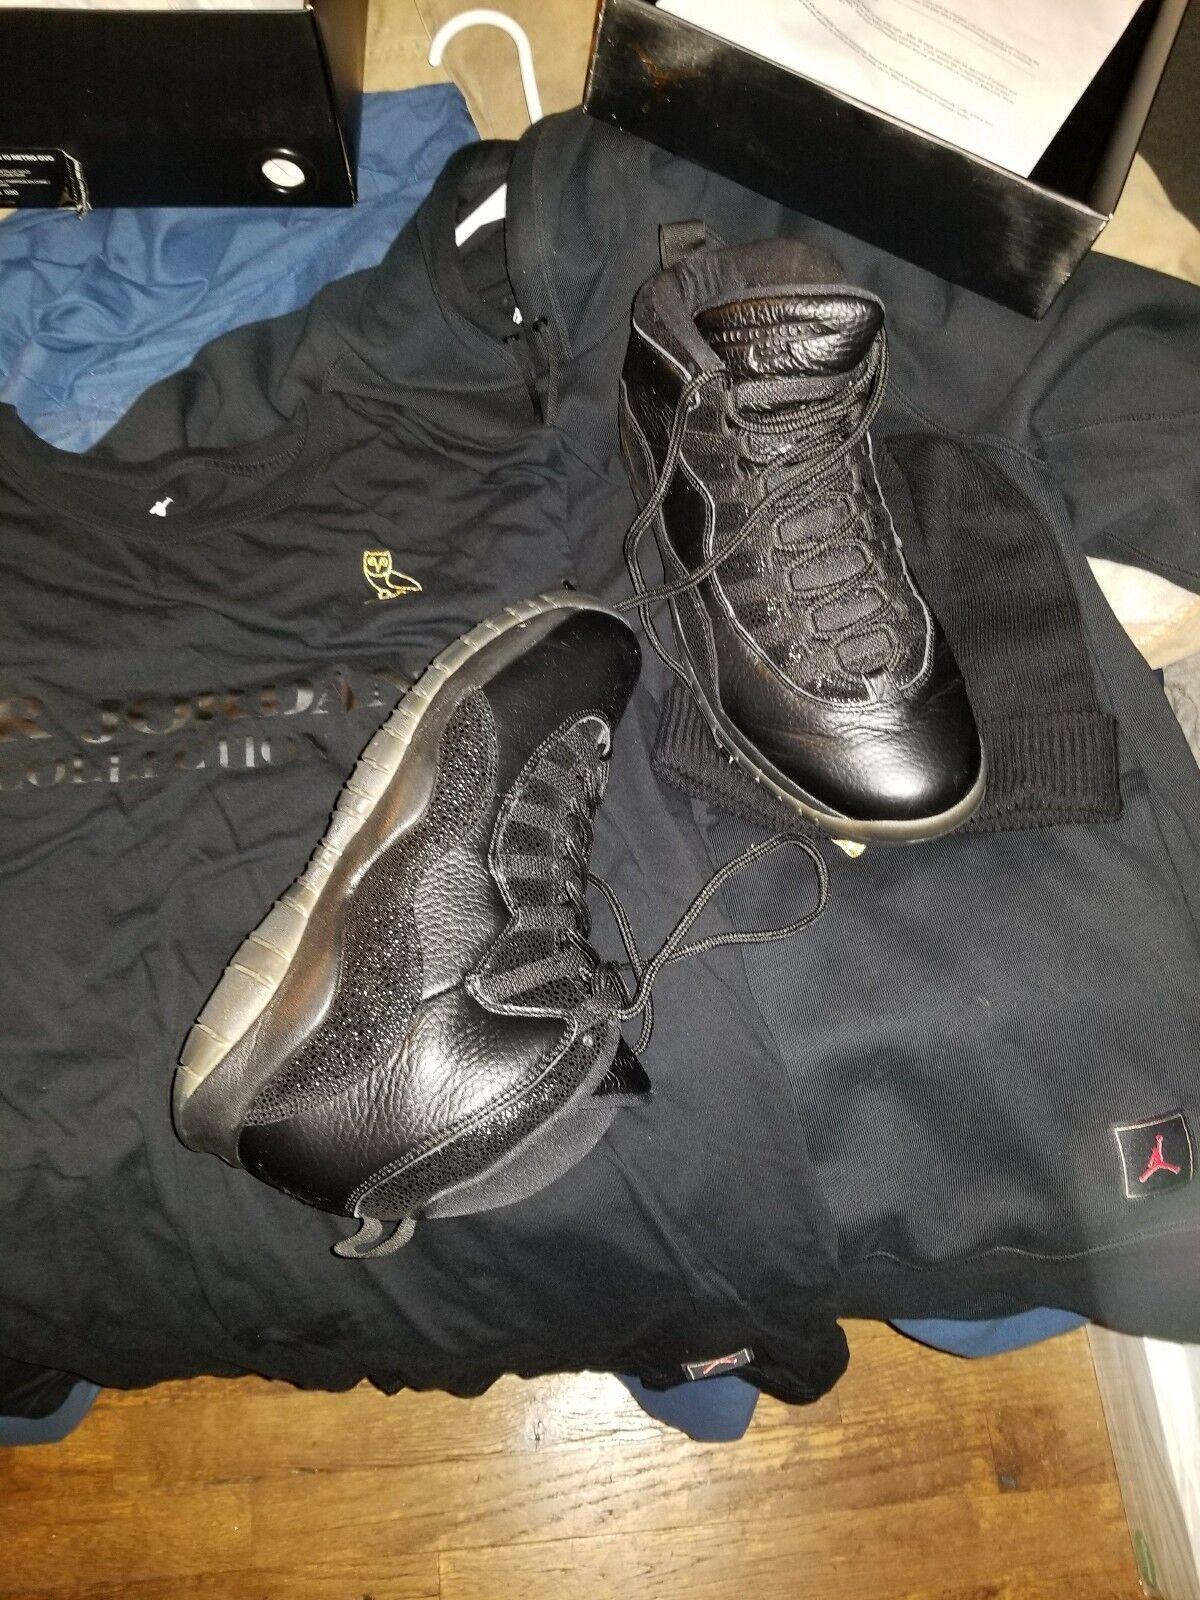 Air Jordan Jordan Jordan 10 OVO Size 10.5 Retro 1 2 3 4 5 6 7 8 9 11 12 13 Banned b45da6